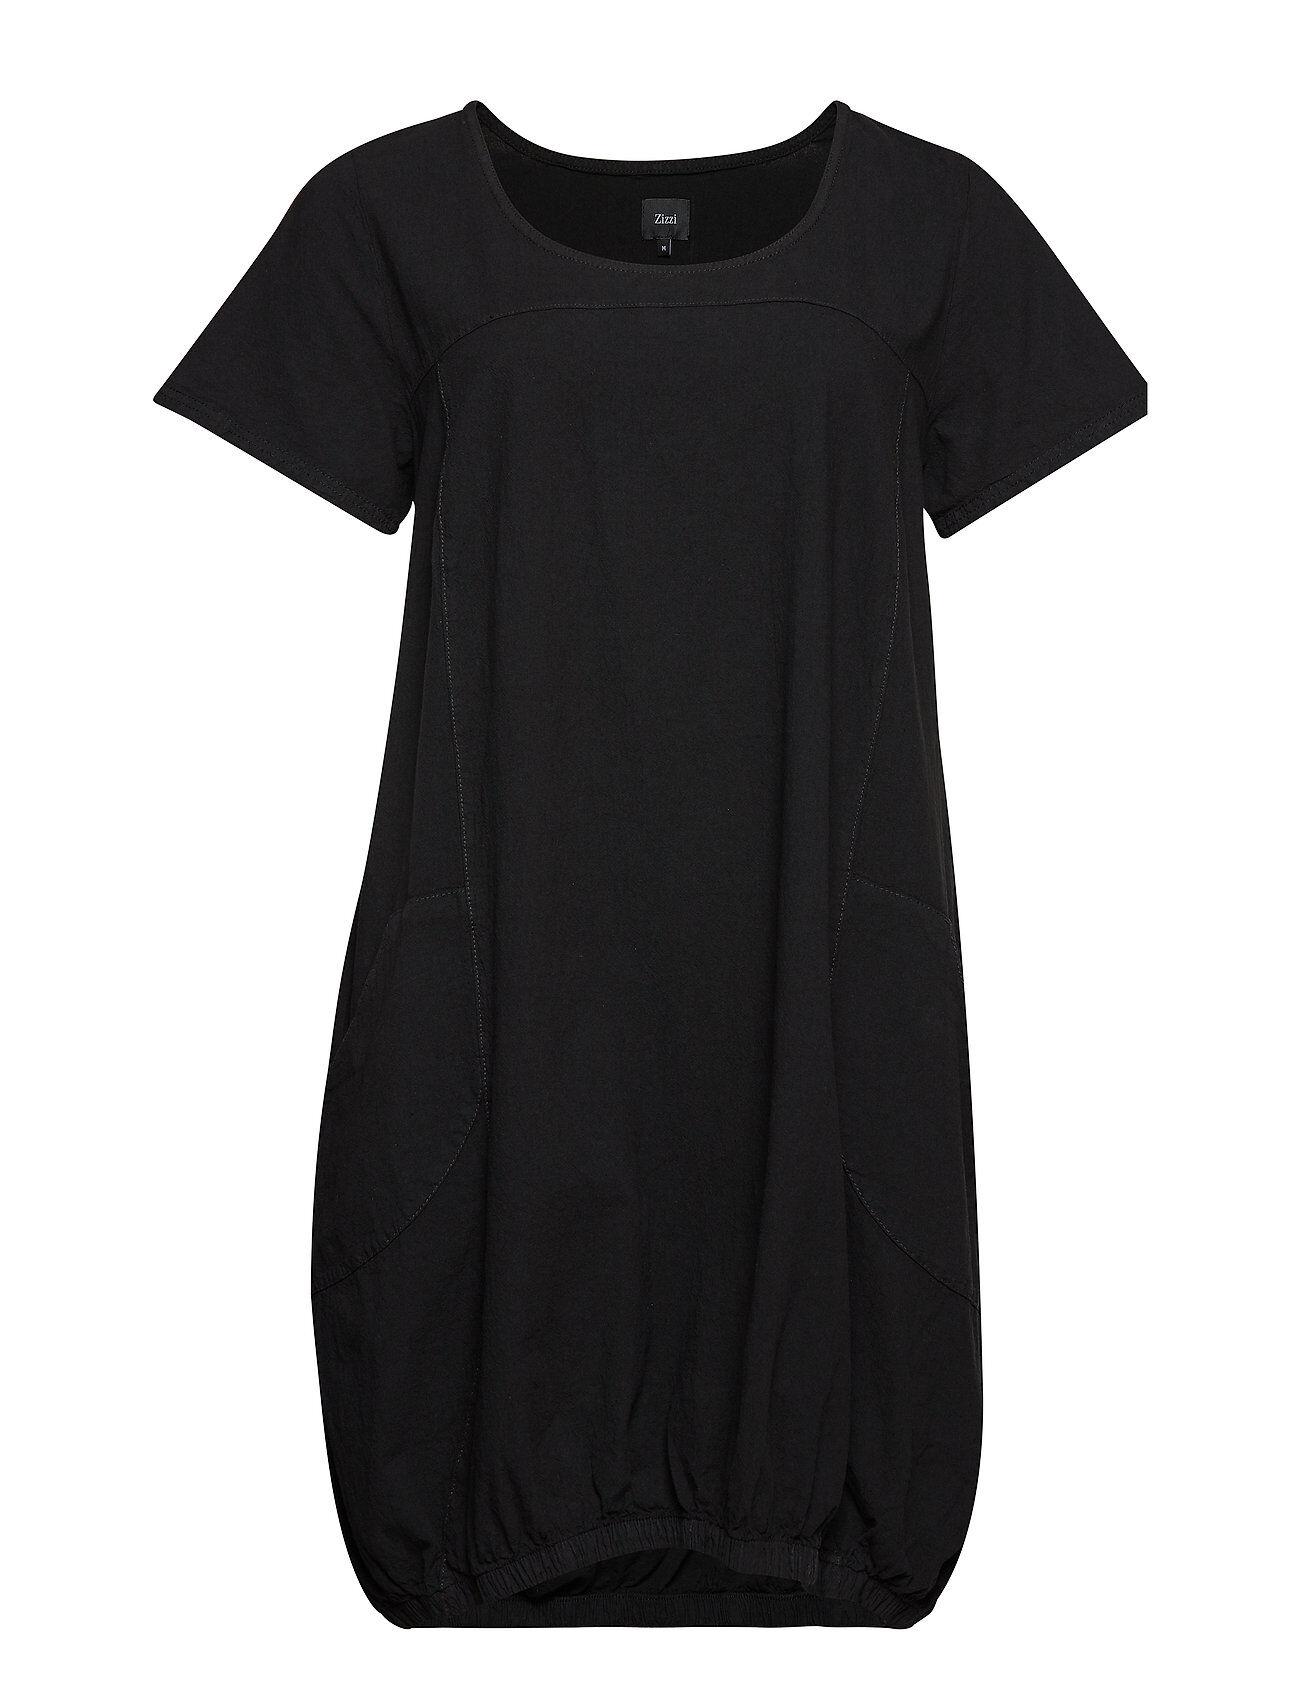 Zizzi Mmarrakesh, S/S, Dress